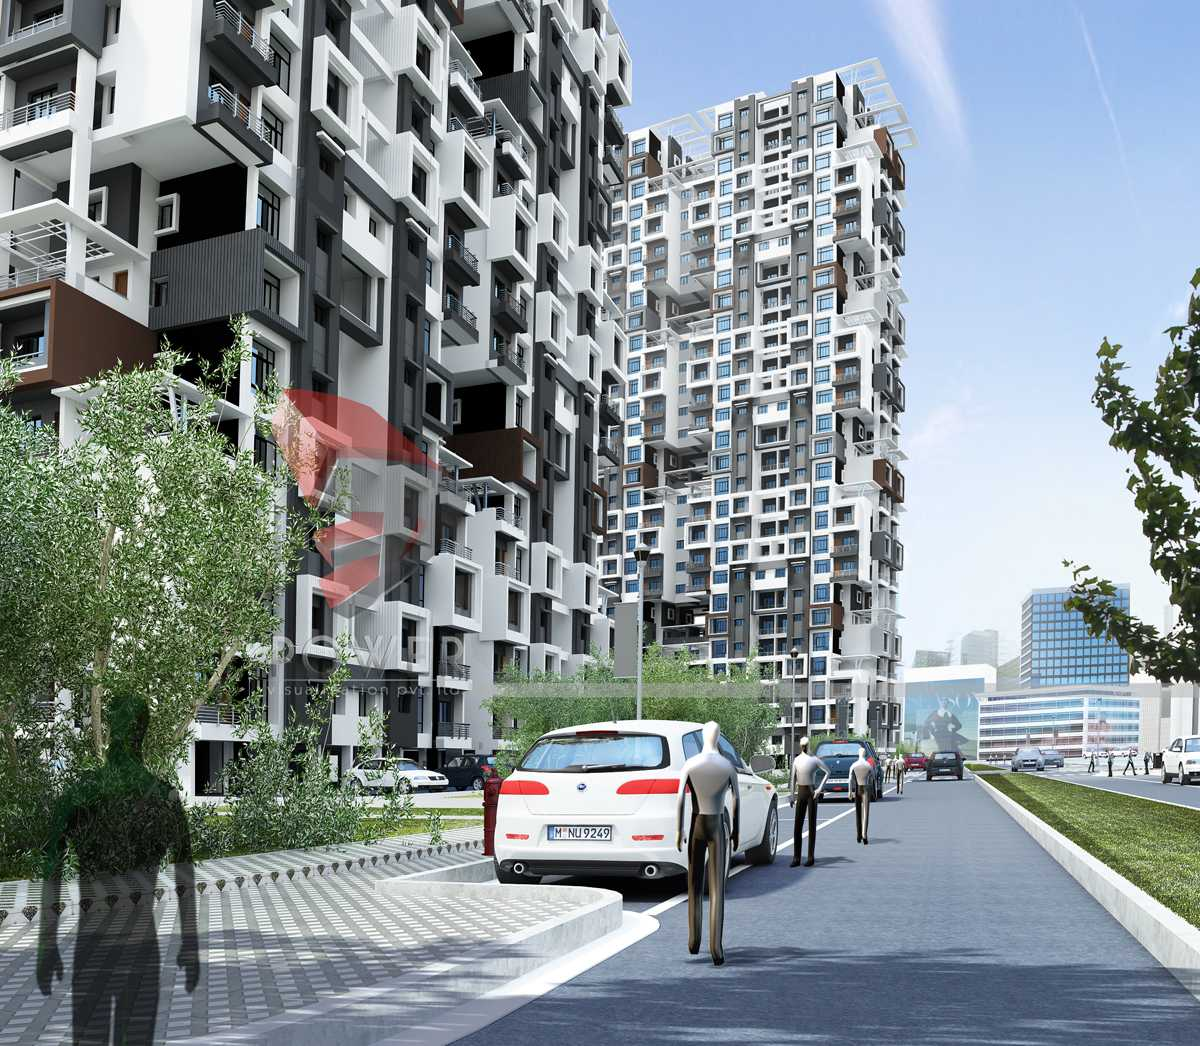 ViewResidential Apartment DesignArchitectural Photorealistic Design